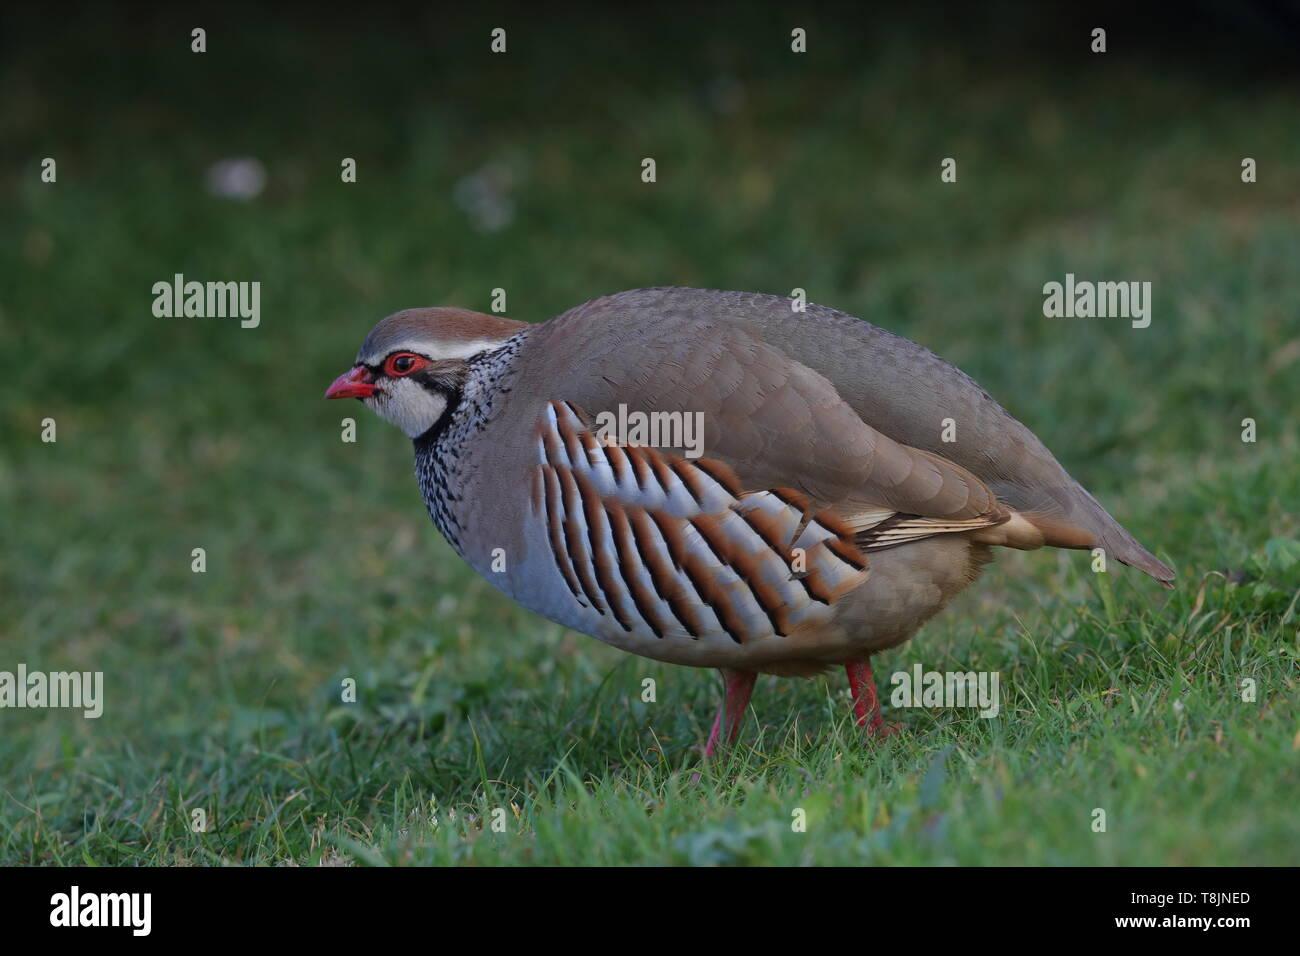 Red-legged Partridge - Stock Image